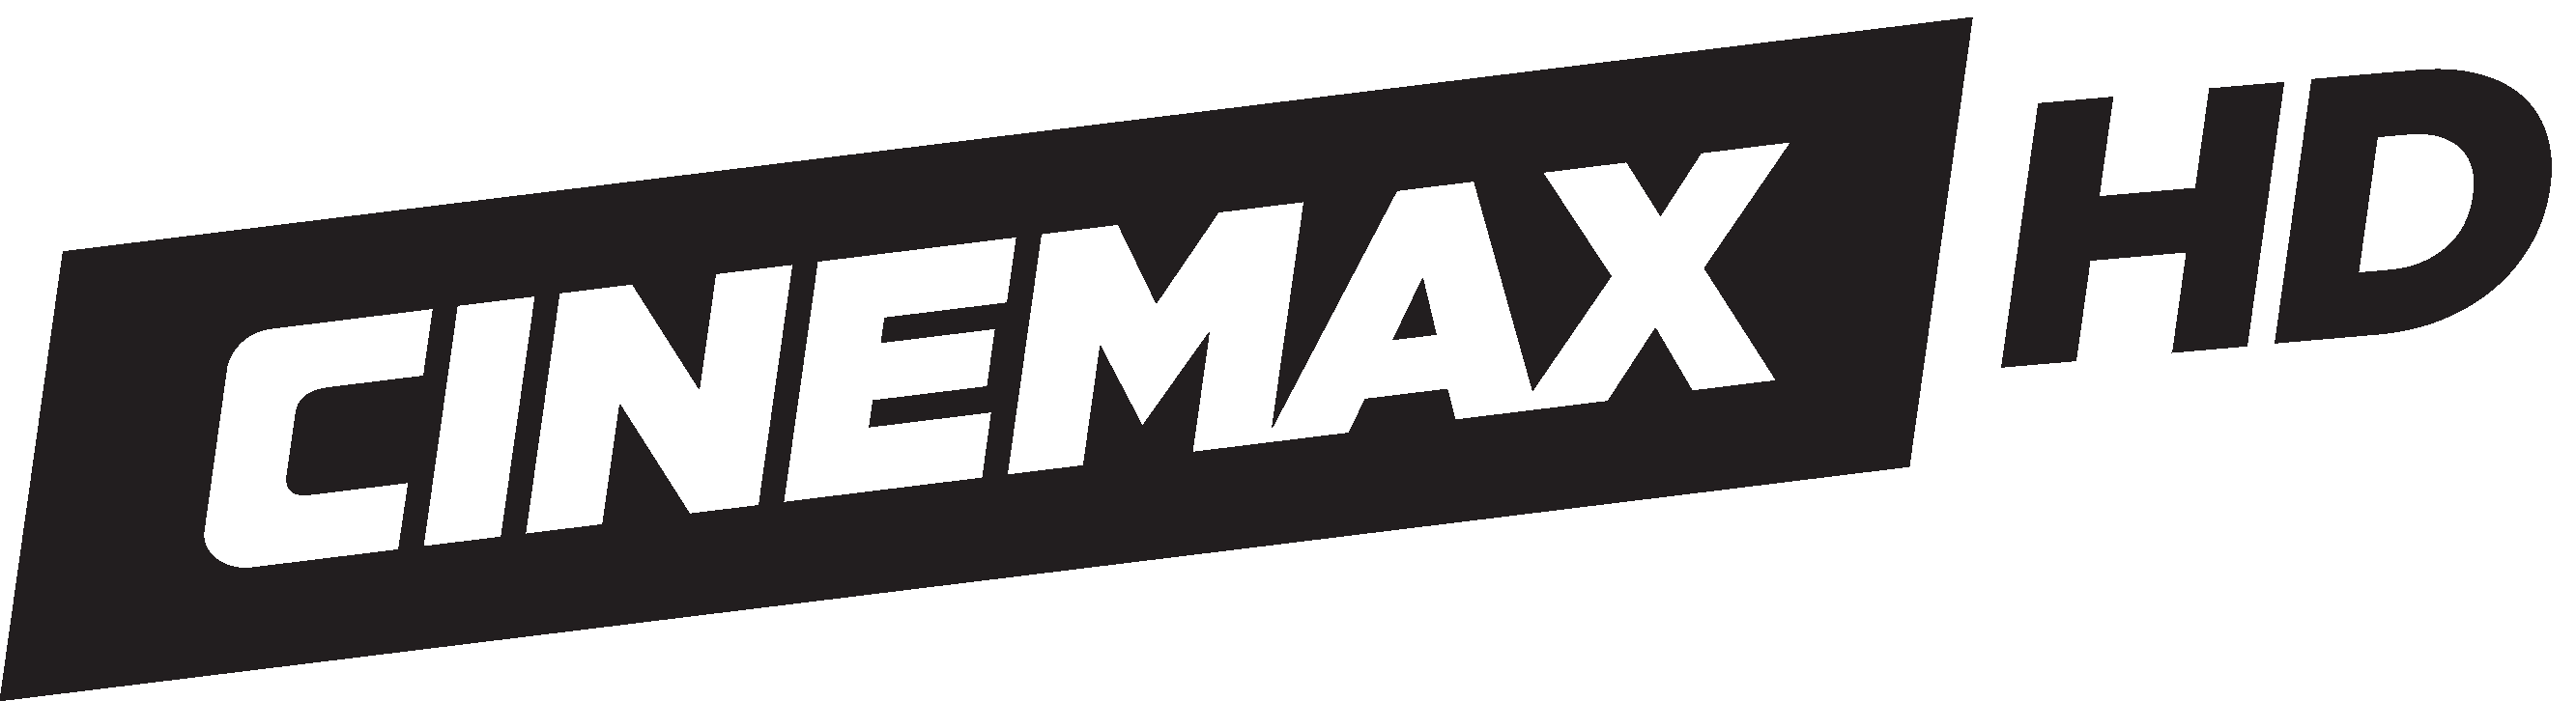 Cinemax HD logo